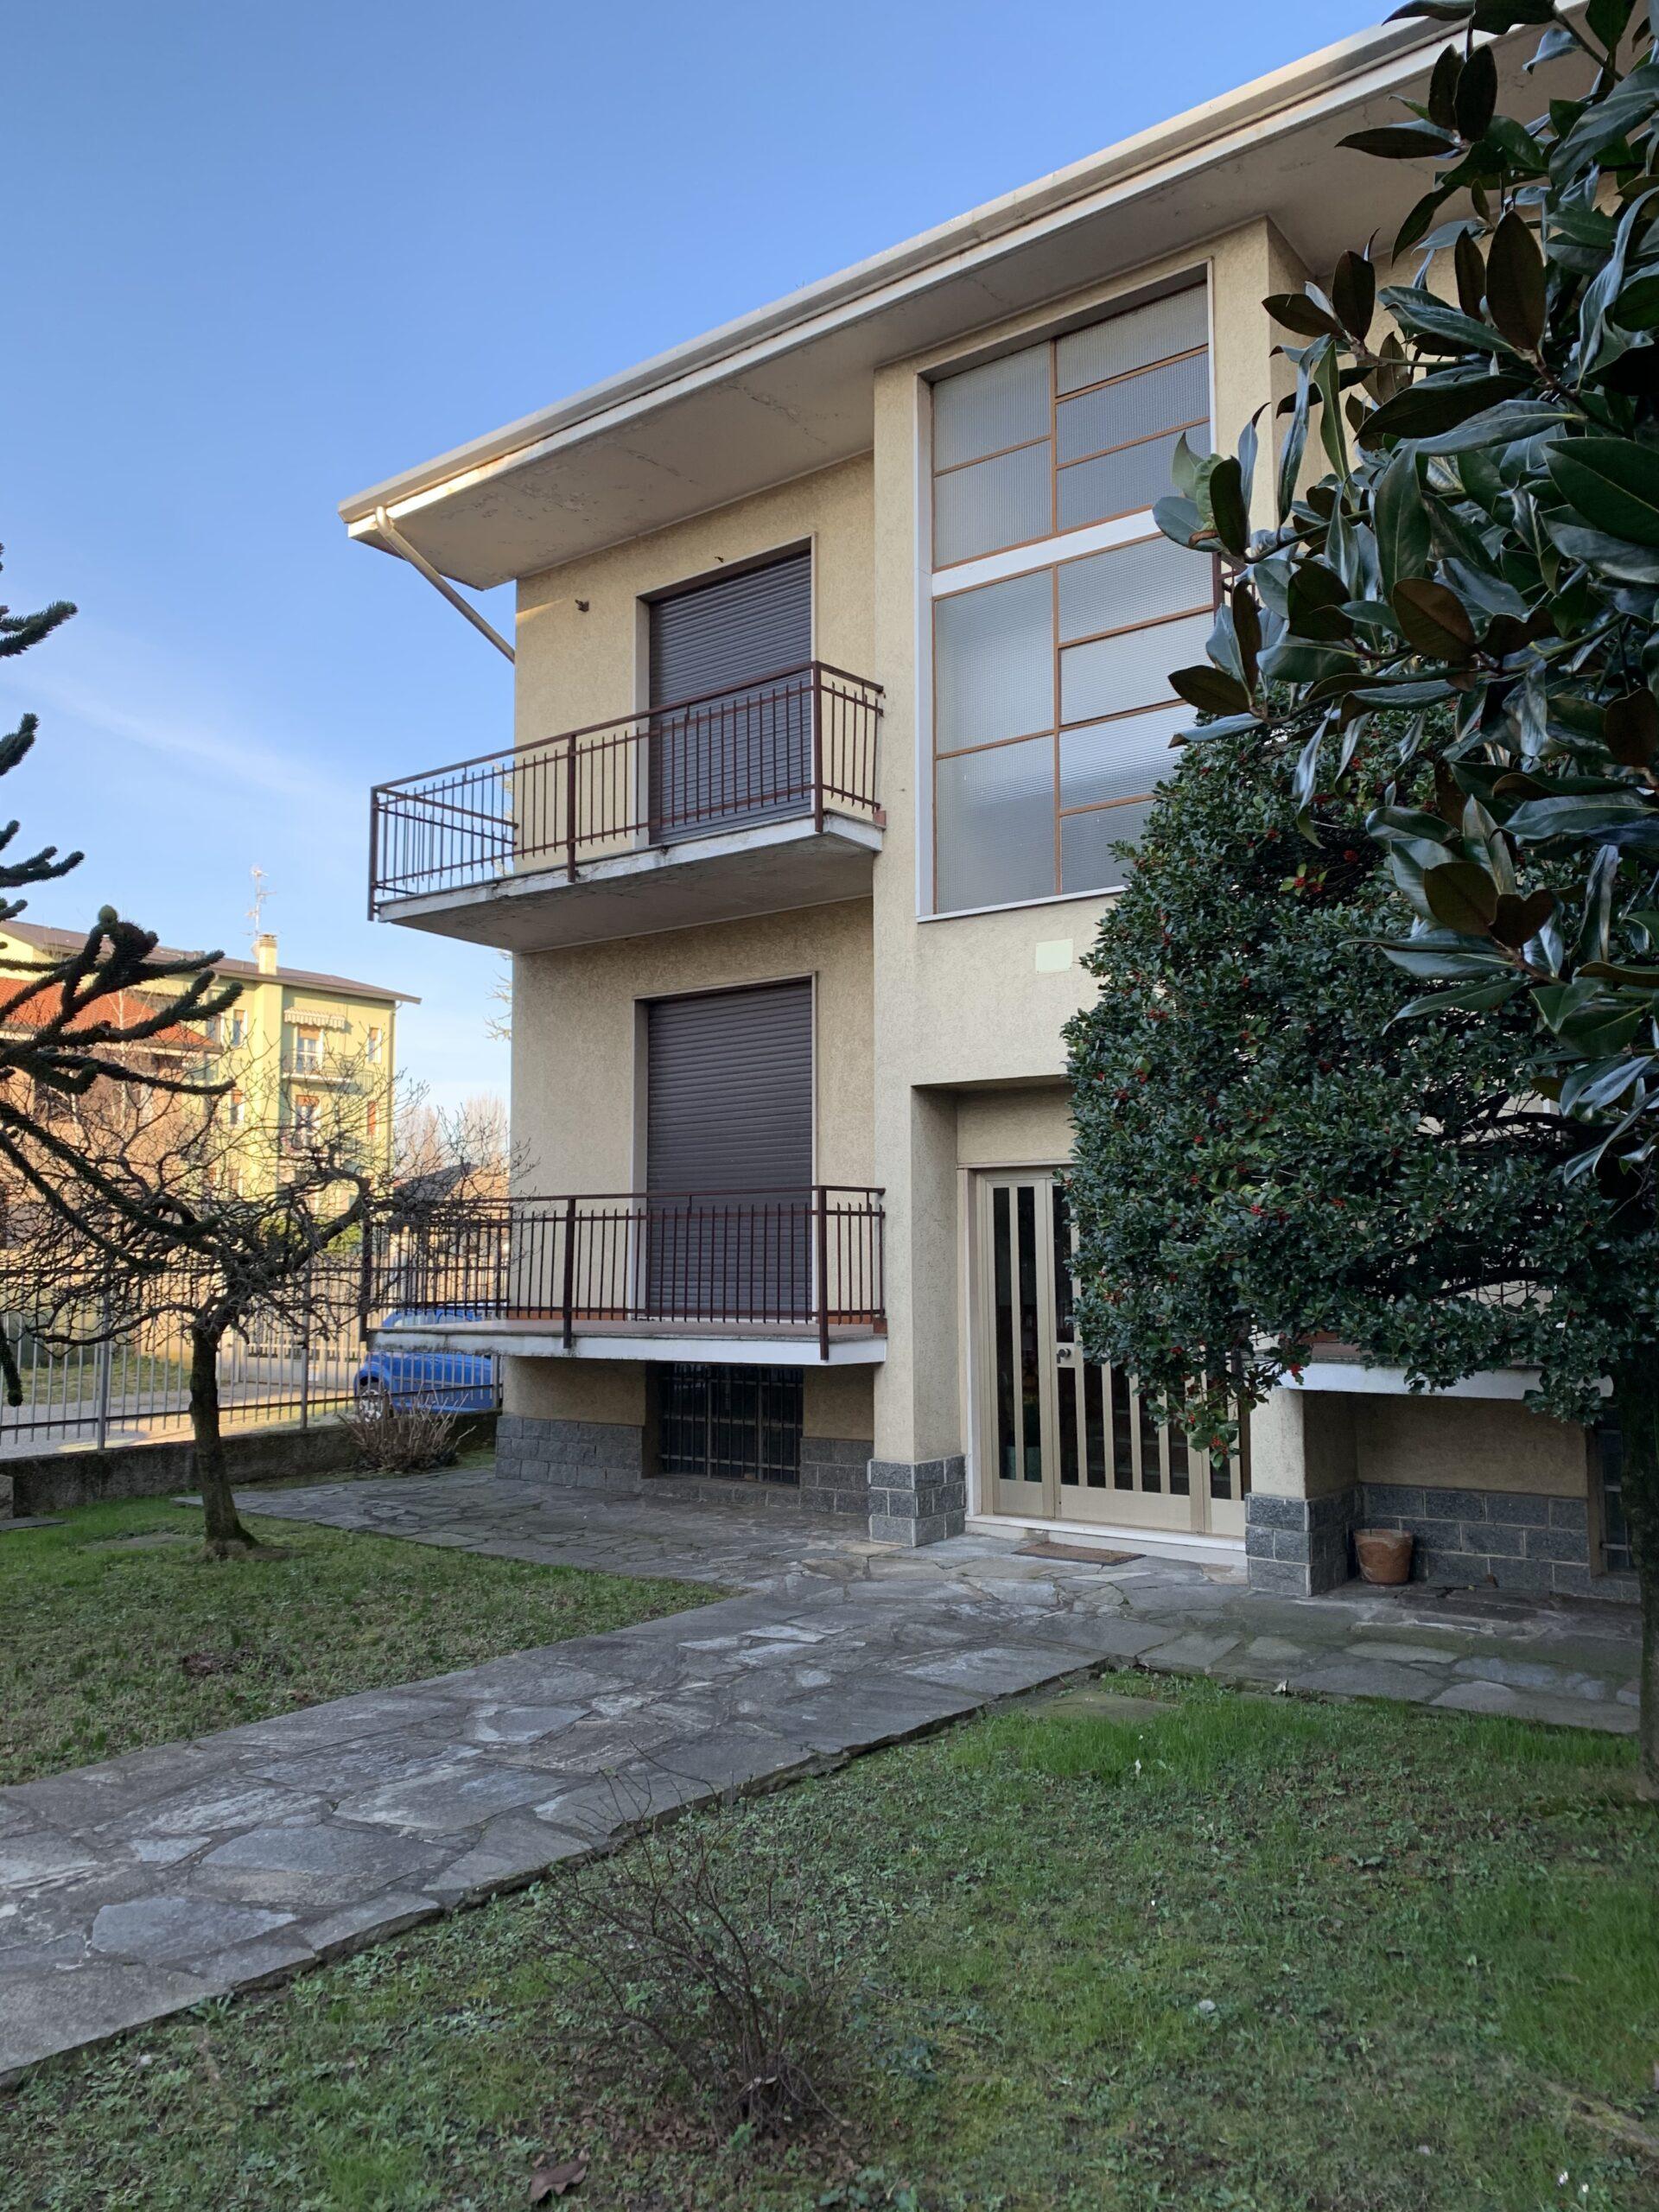 Garbagnate Milanese : Villa Bifamiliare